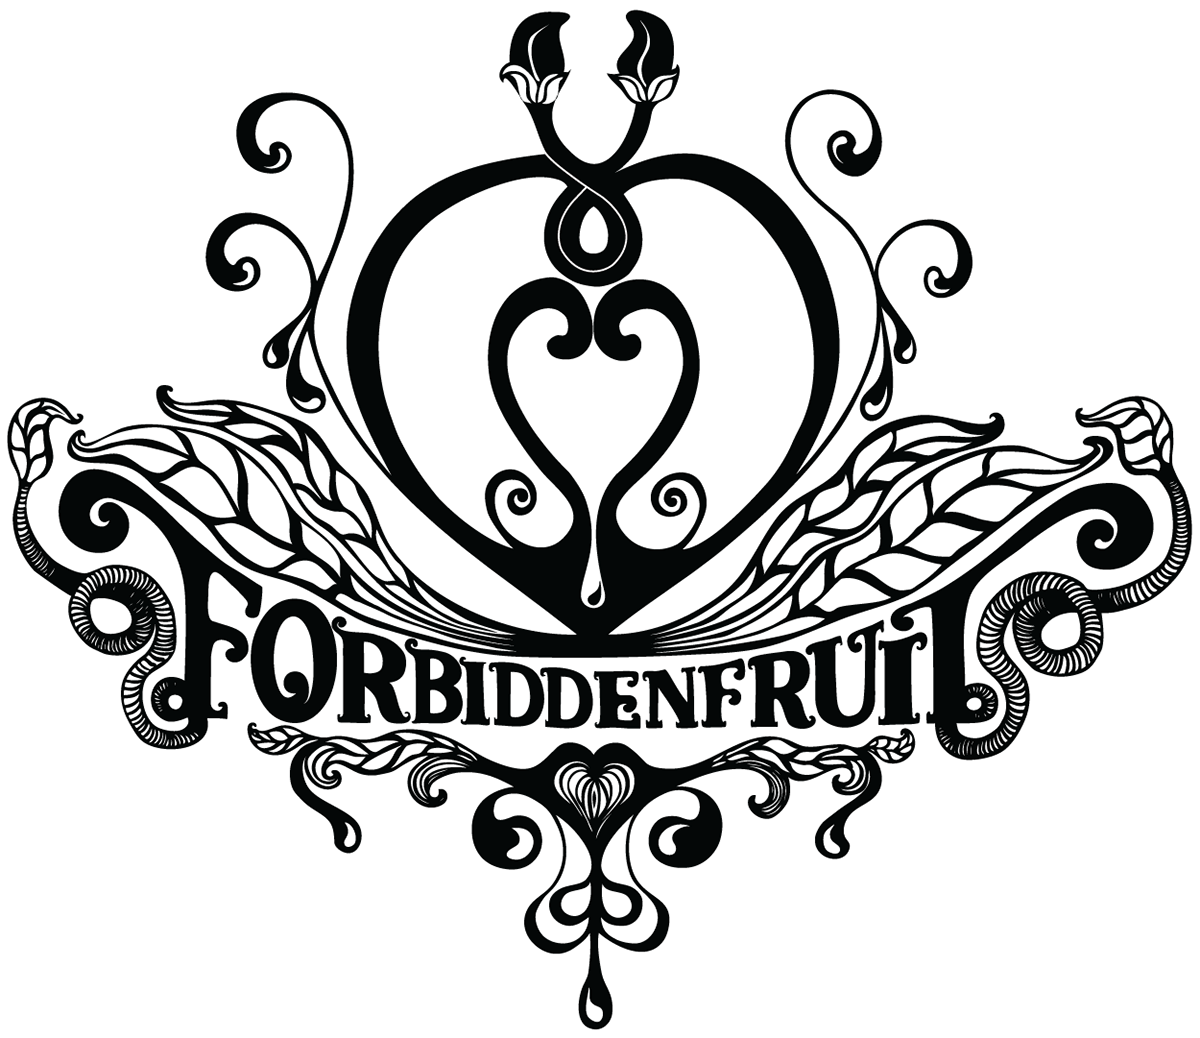 Forbidden Fruit On Behance